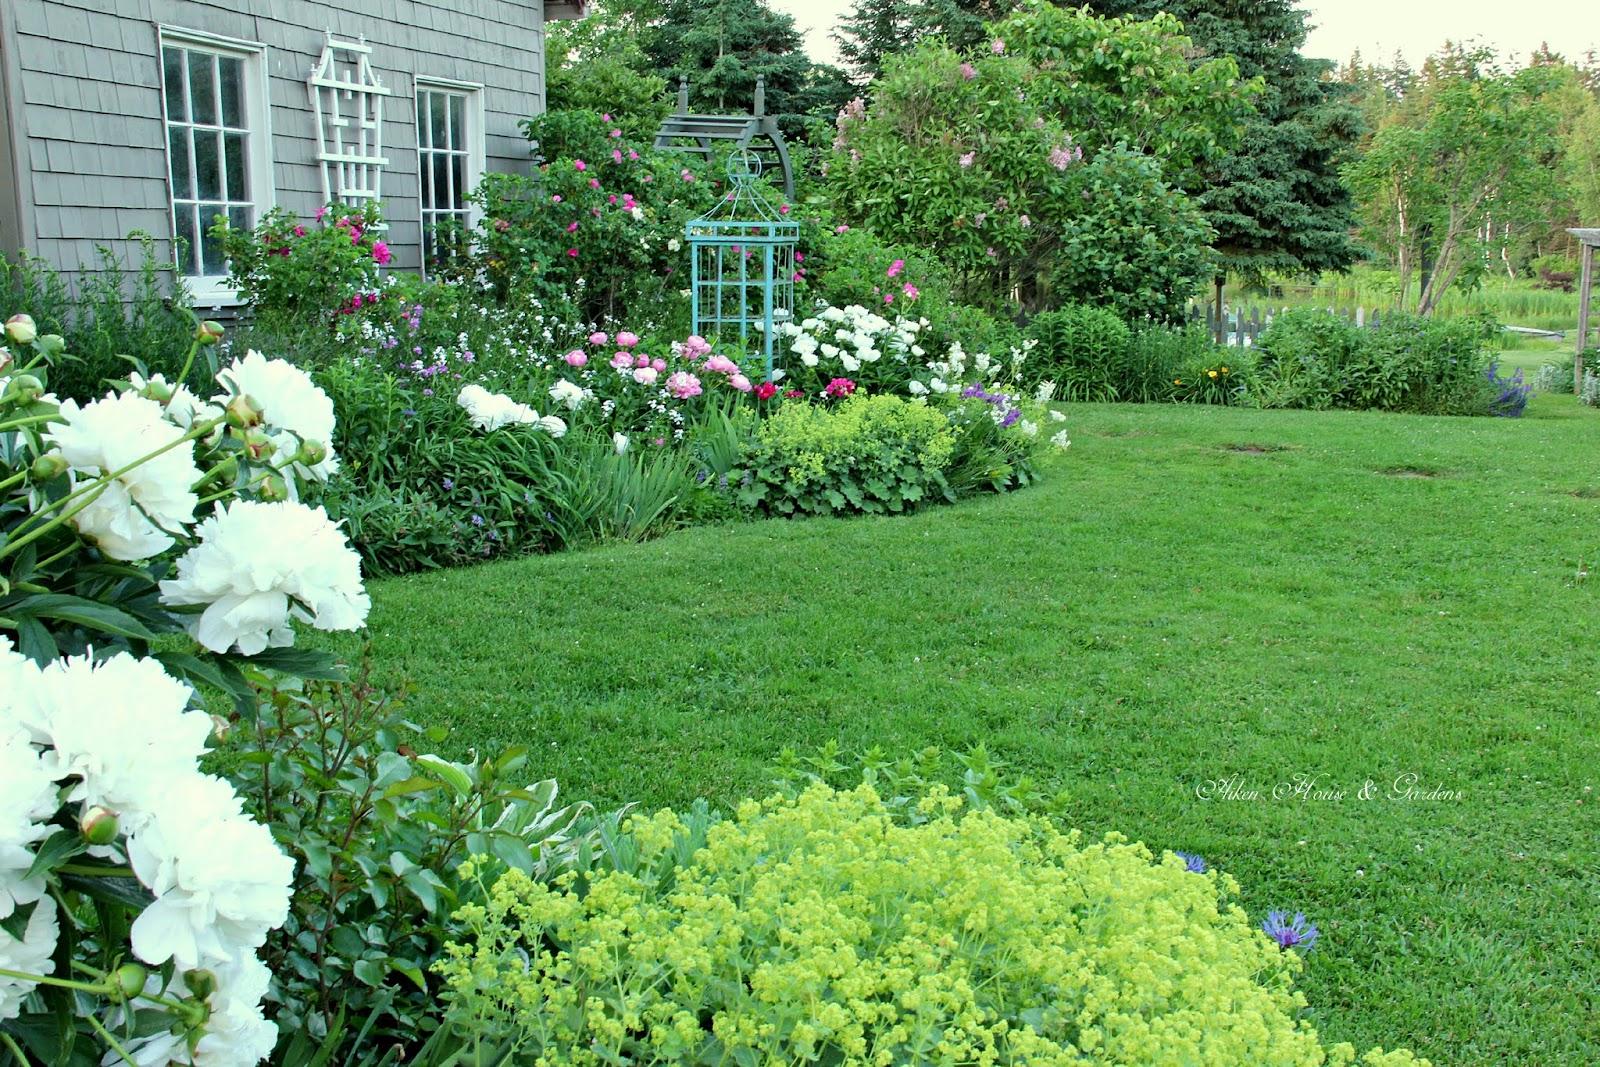 aiken house gardens french garden blues. Black Bedroom Furniture Sets. Home Design Ideas